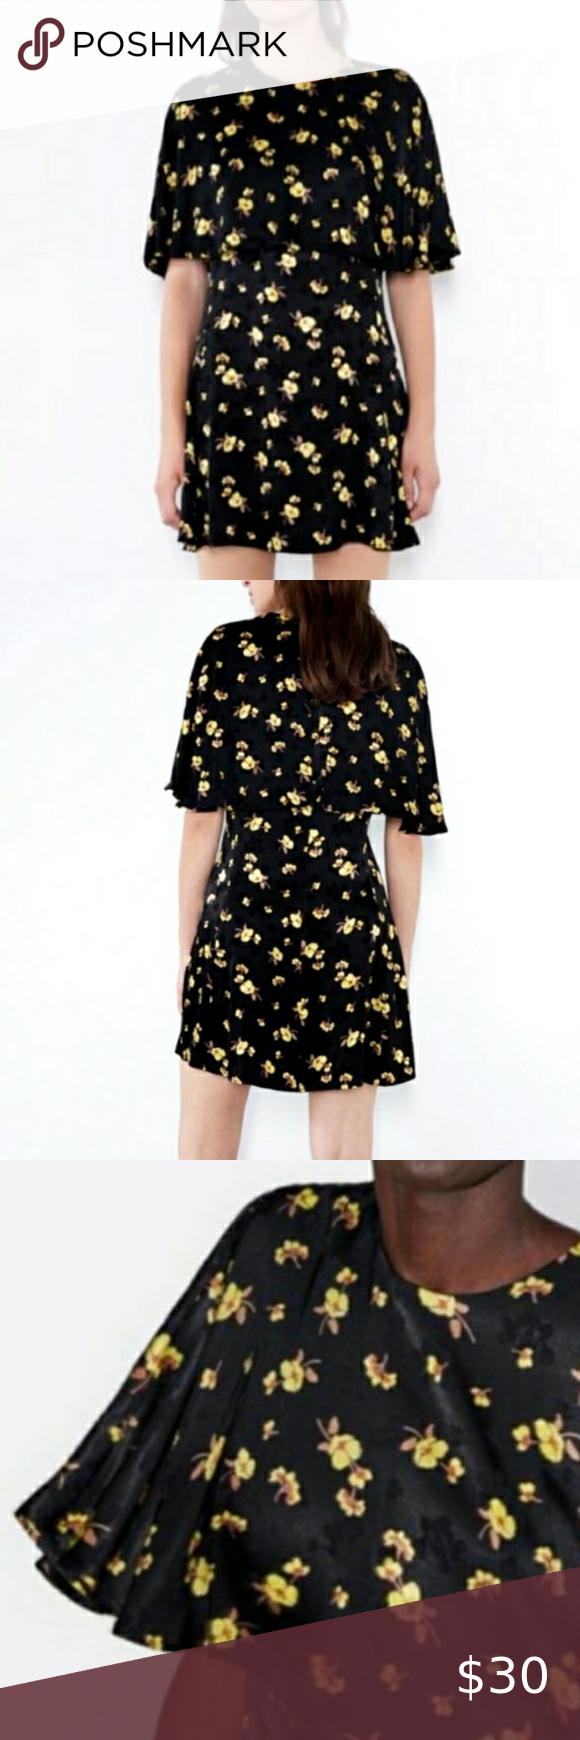 Nwt Zara Black And Gold Yellow Floral Cape Dress Linen Mini Dress Long Sleeve Sequin Dress Cape Dress [ 1740 x 580 Pixel ]